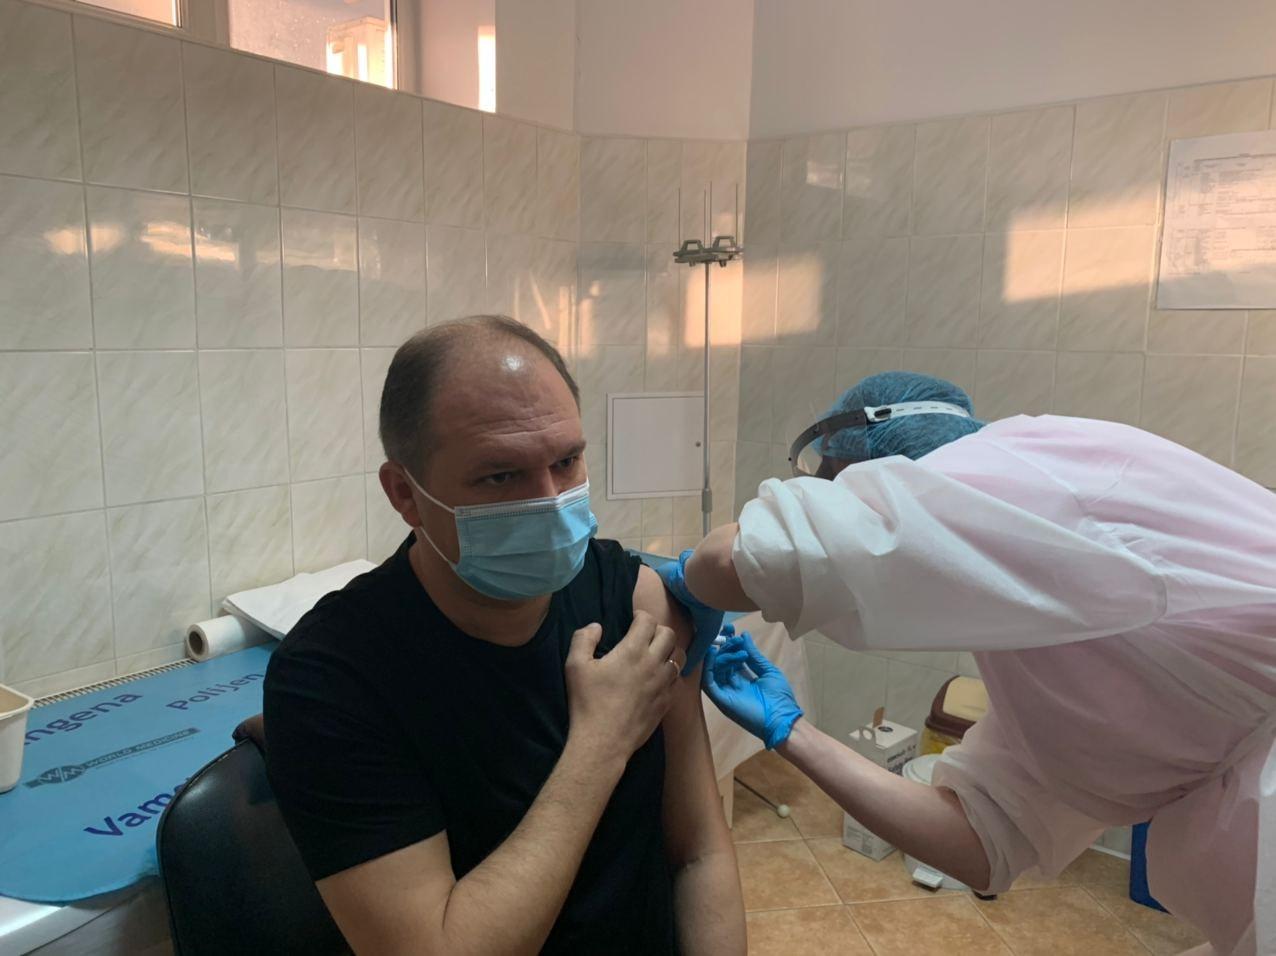 Ион Чебан сделал прививку от гриппа